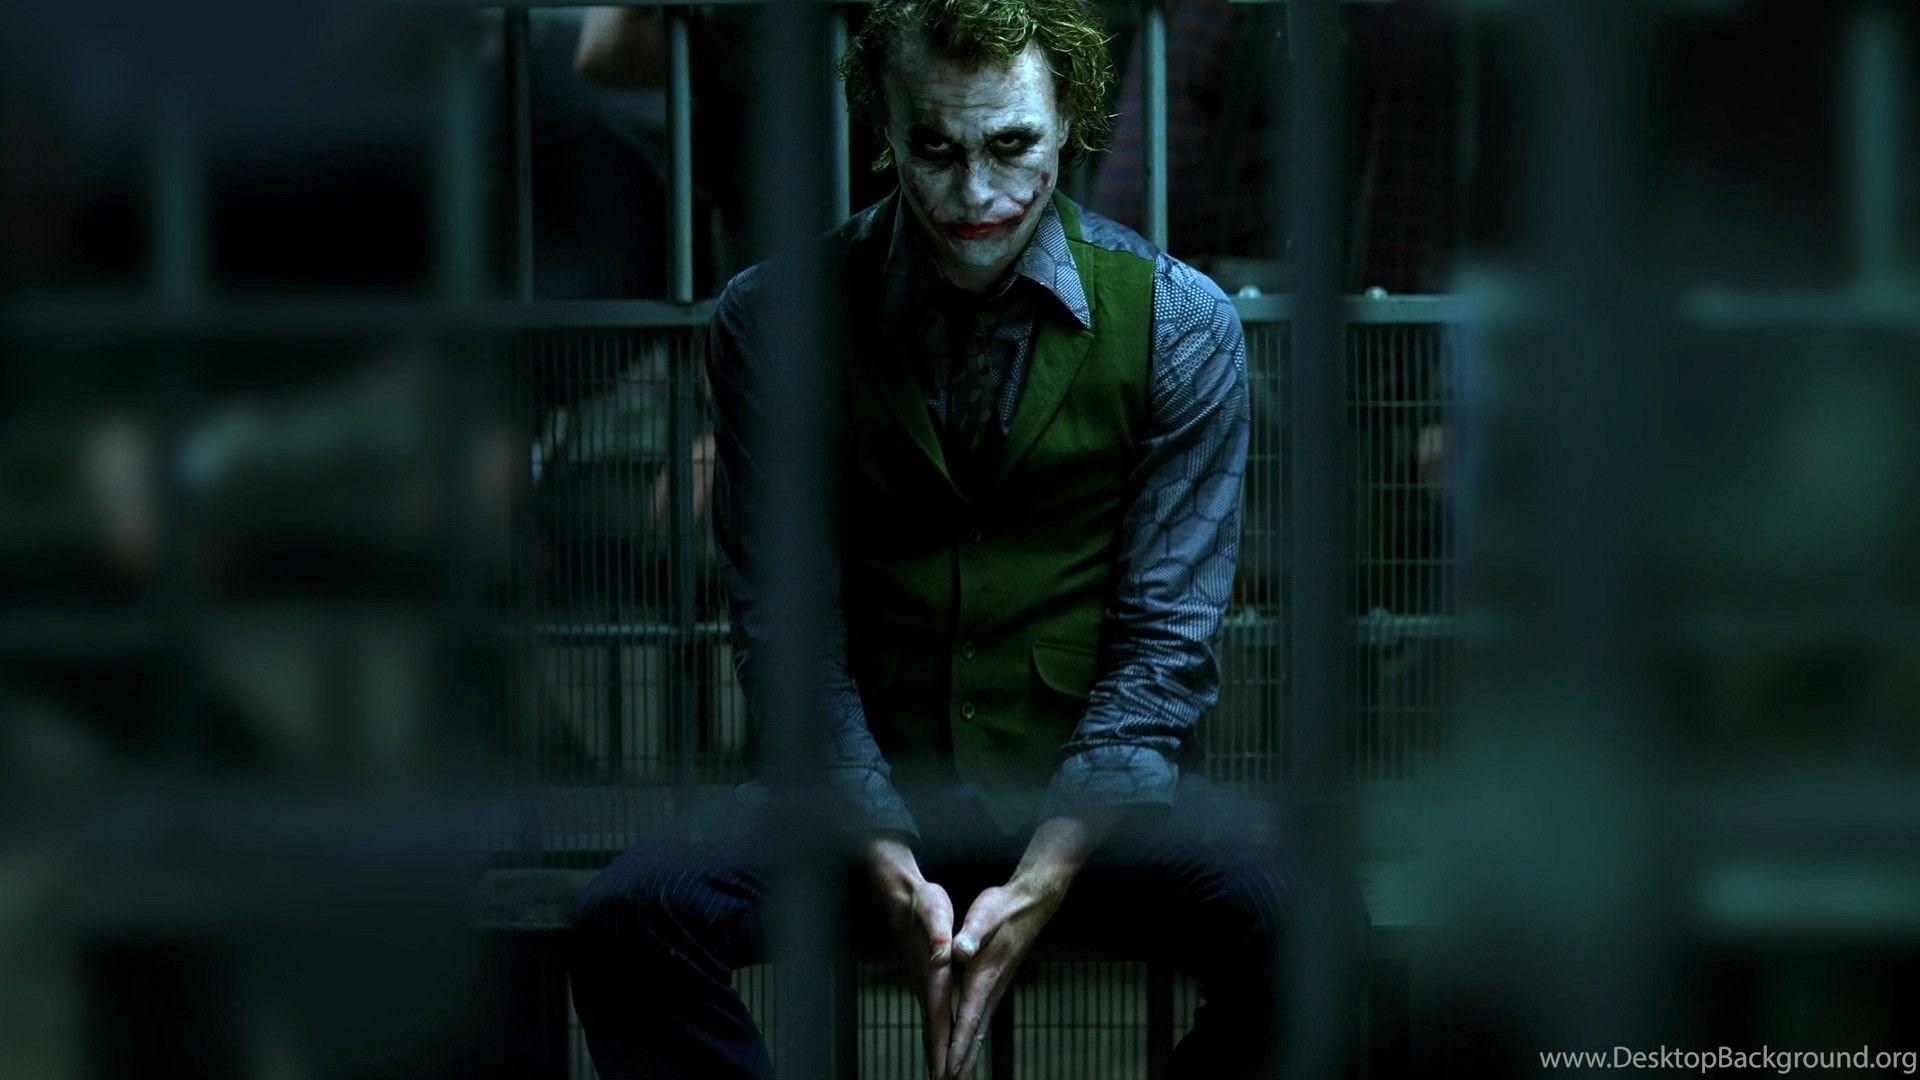 Heath Ledger Joker 1920x1080 Hd Wallpapers And Free Stock Photo Desktop Background